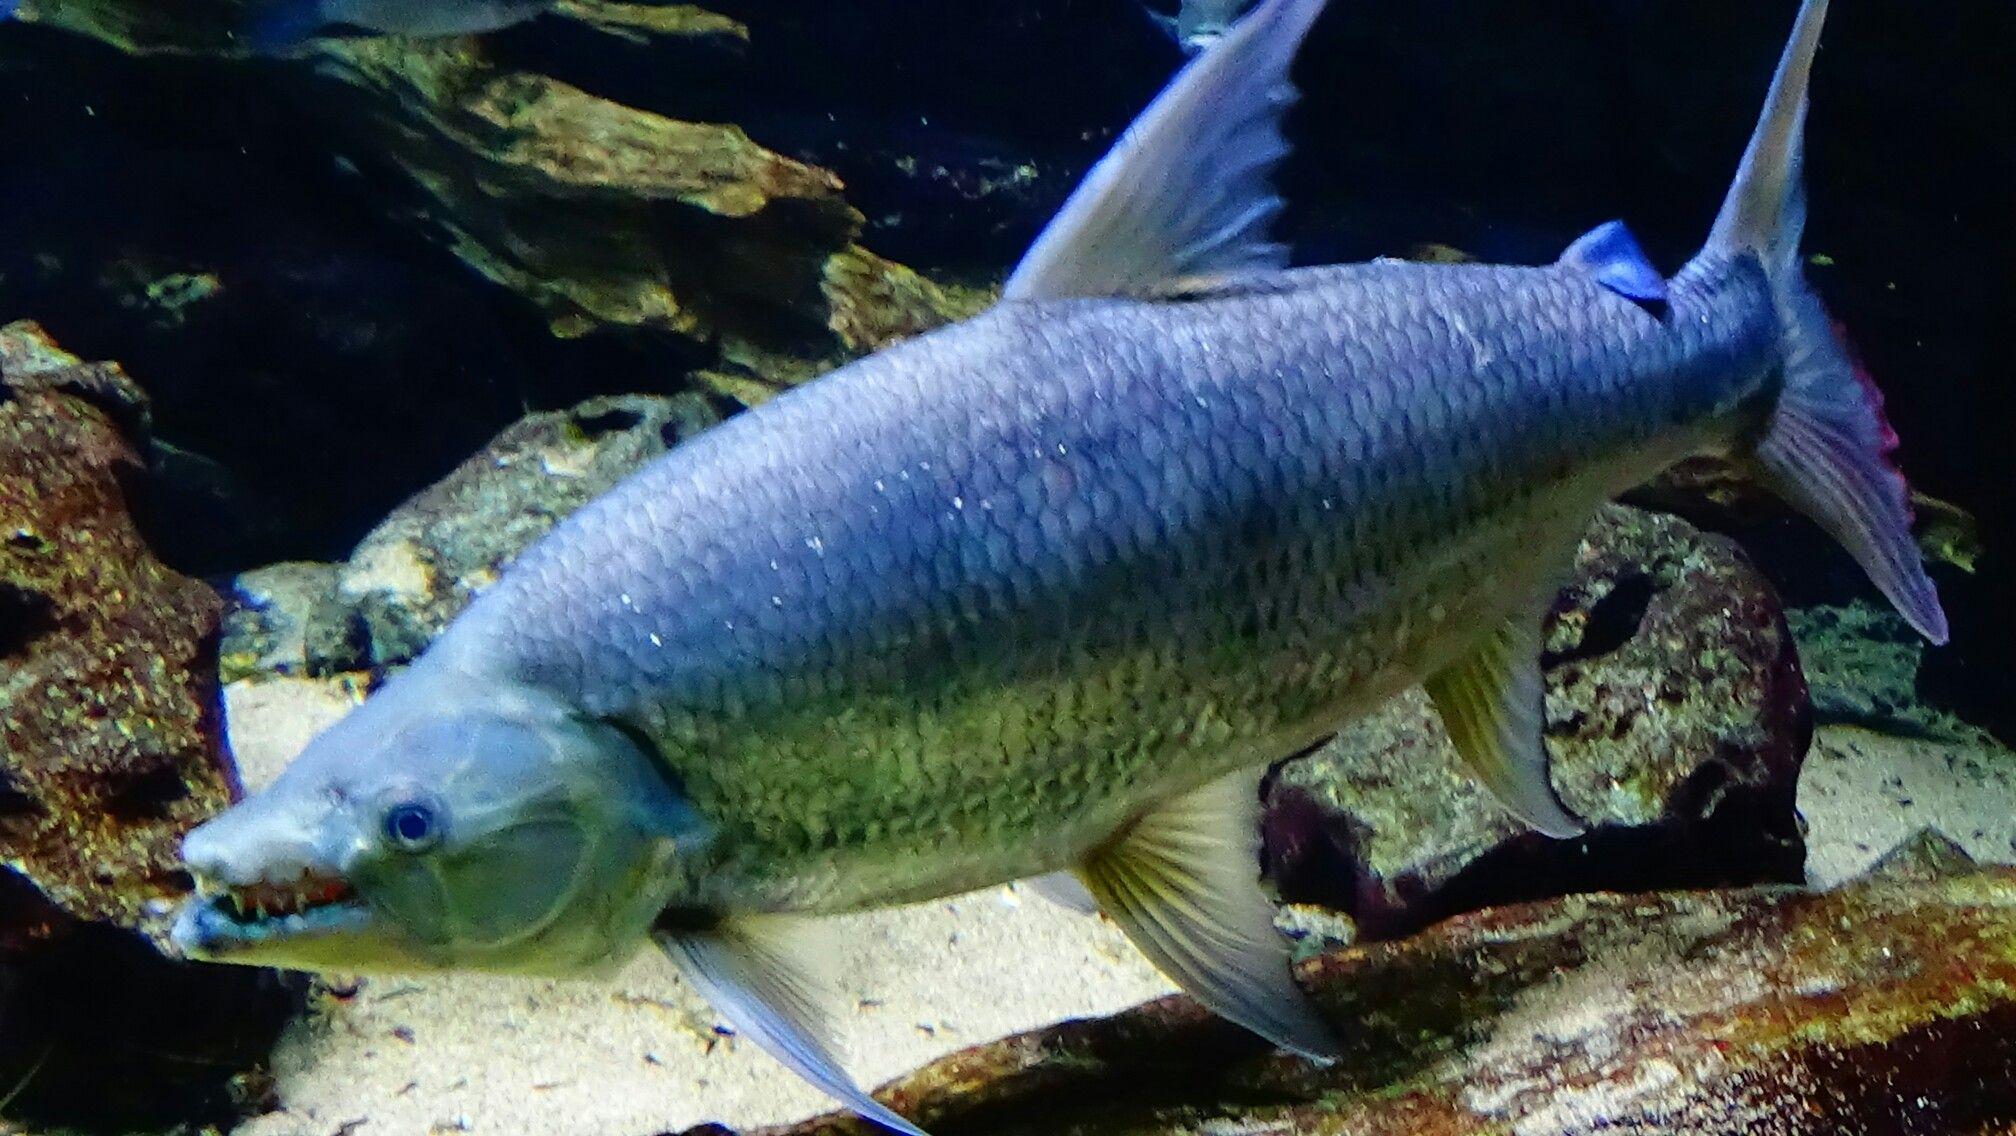 Freshwater fish killers - Hydrocynus Goliath Freshwater Fishsummarybizarre